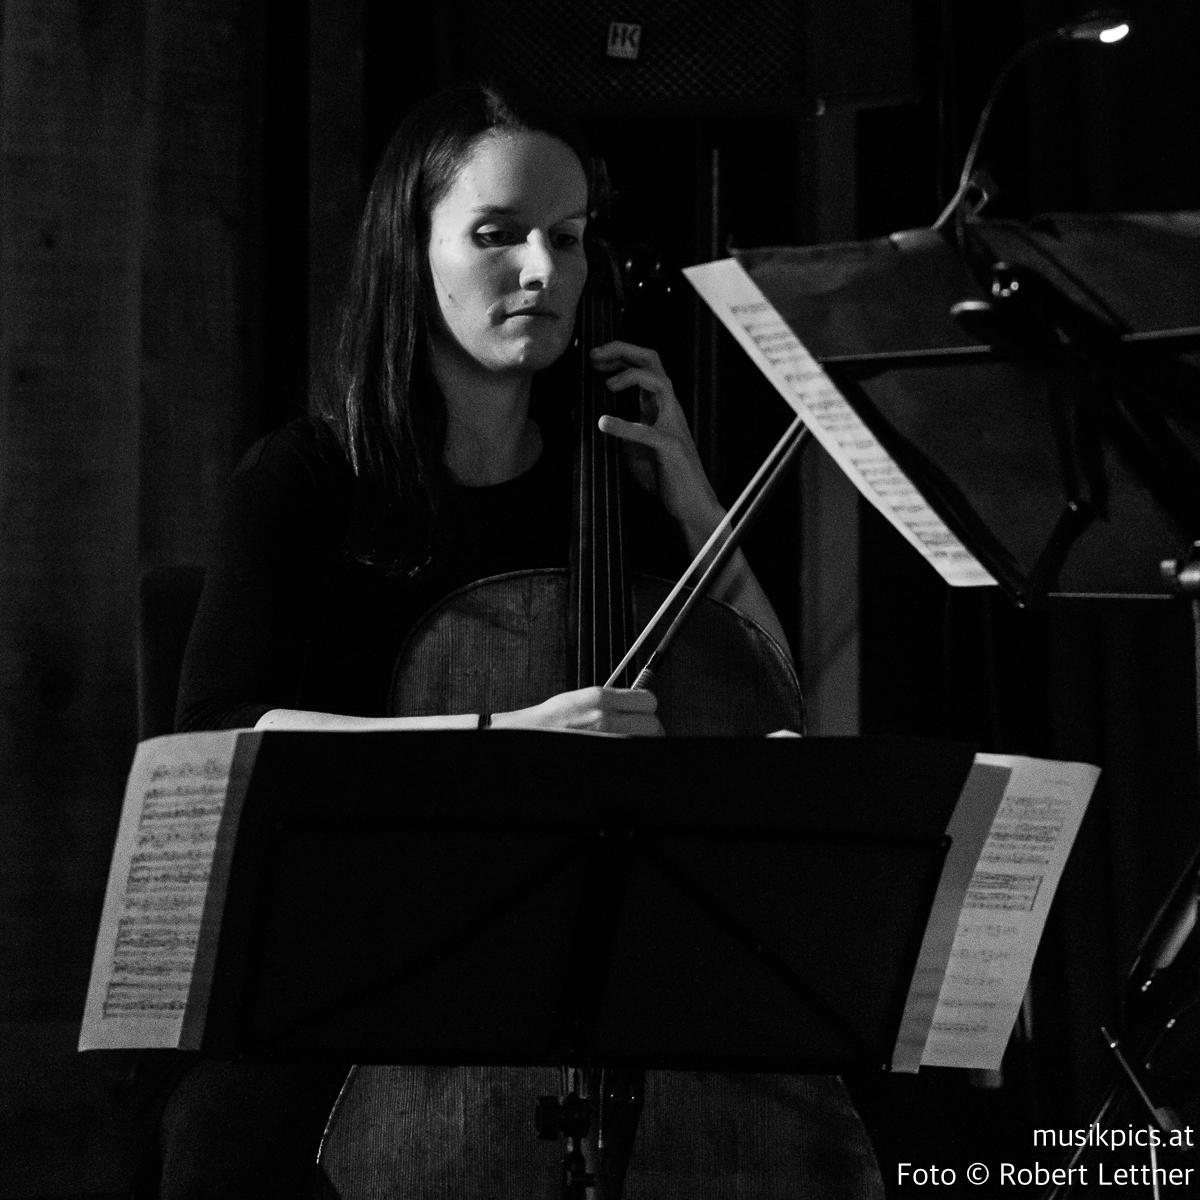 Robert-Lettner-Musikpics-Live-Music-Photography-Phoebe-Violet-DSC01985